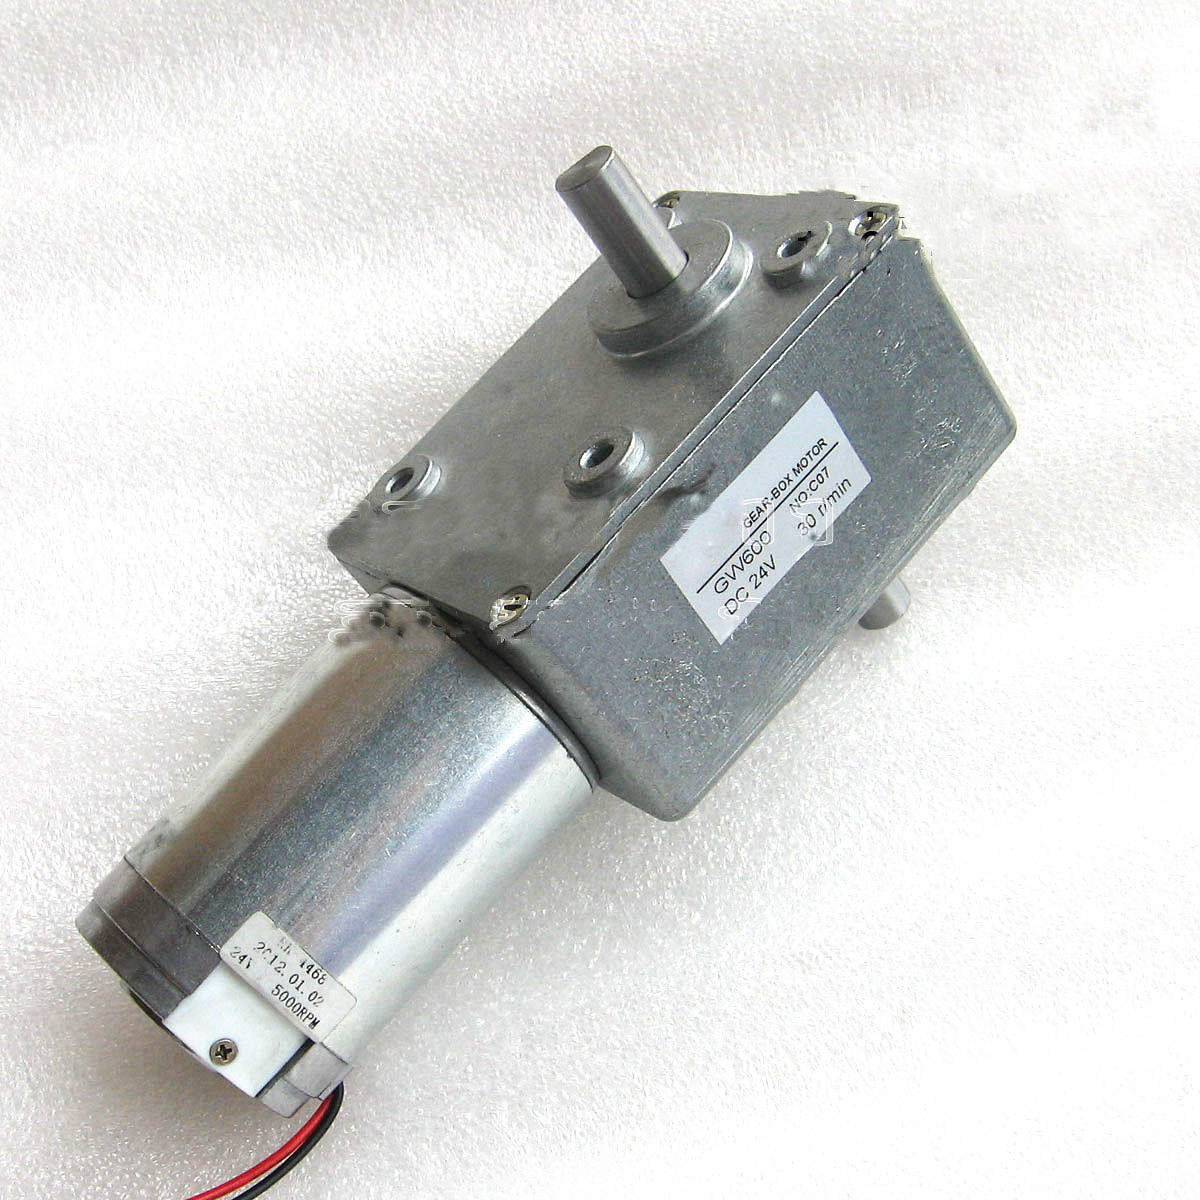 High Torque Turbo Worm Gear Motor 50RPM DC24V 4.9NM 50KG.CM Reduction Motor